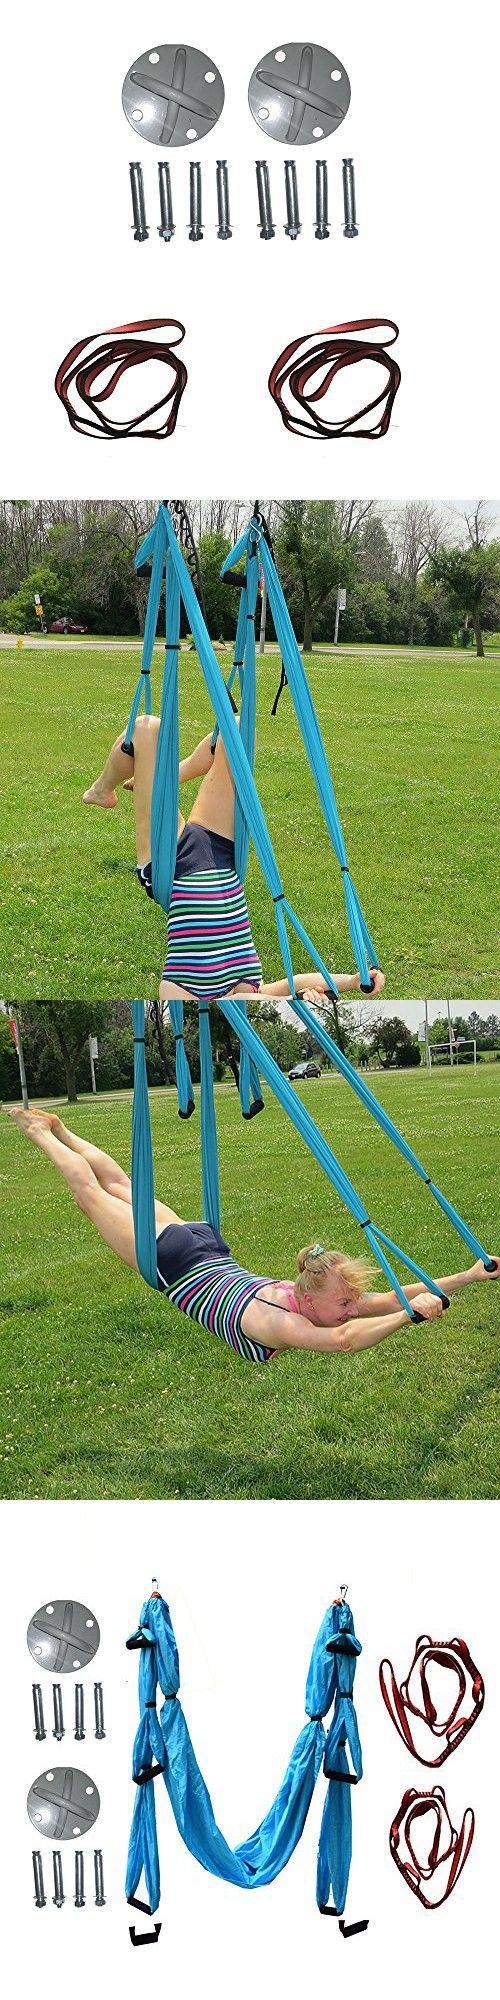 Egojin high strength decompression hammock inversion trapeze anti